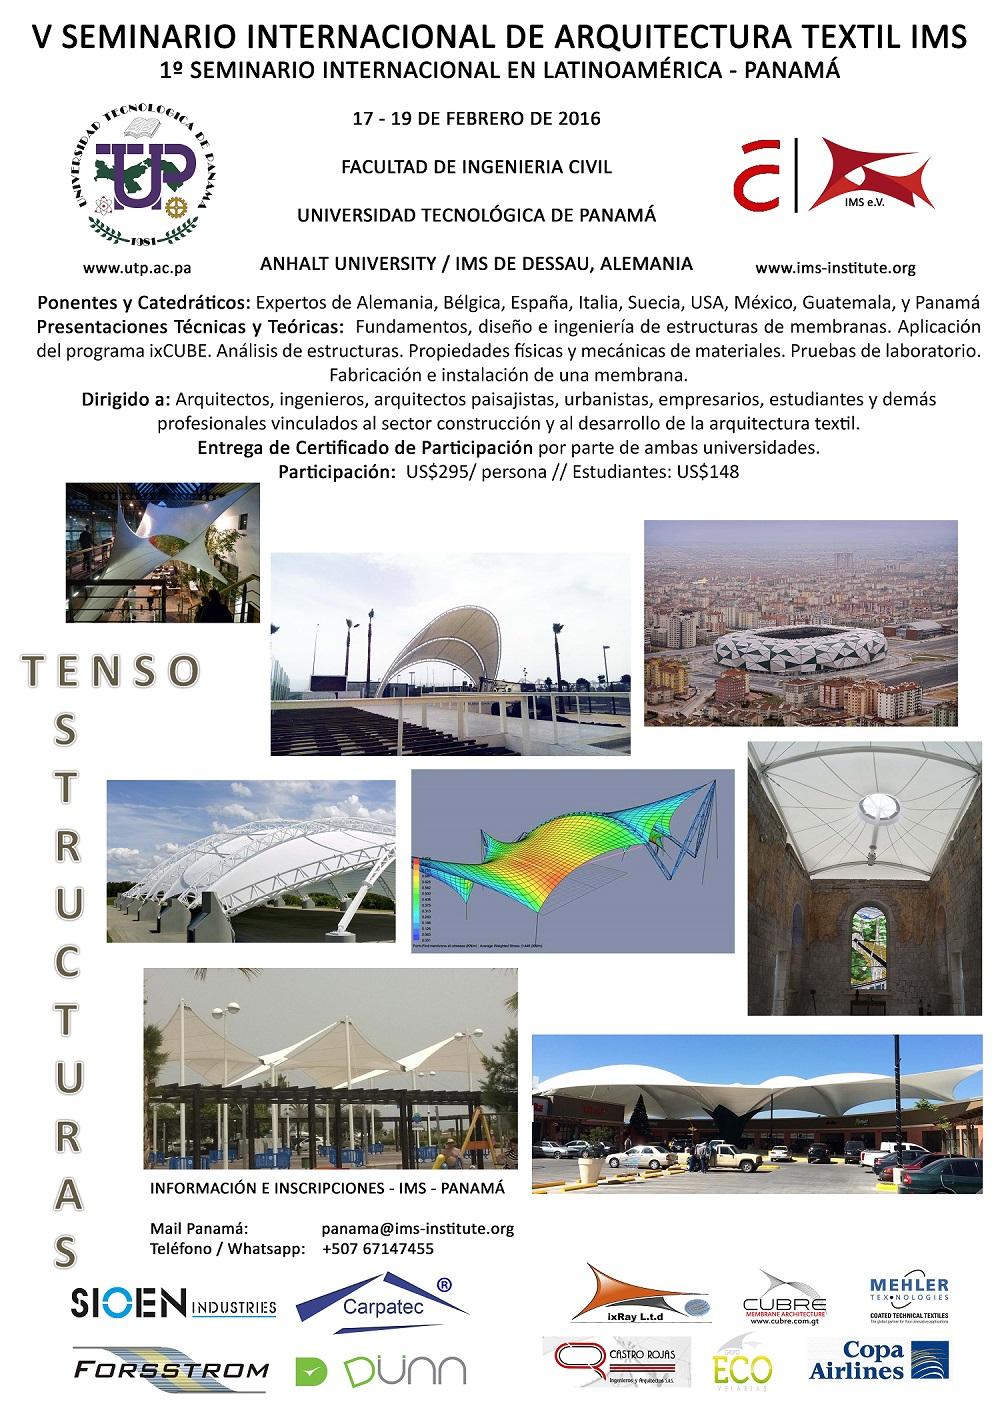 V Seminario Internacional de Arquitectura Textil IMS